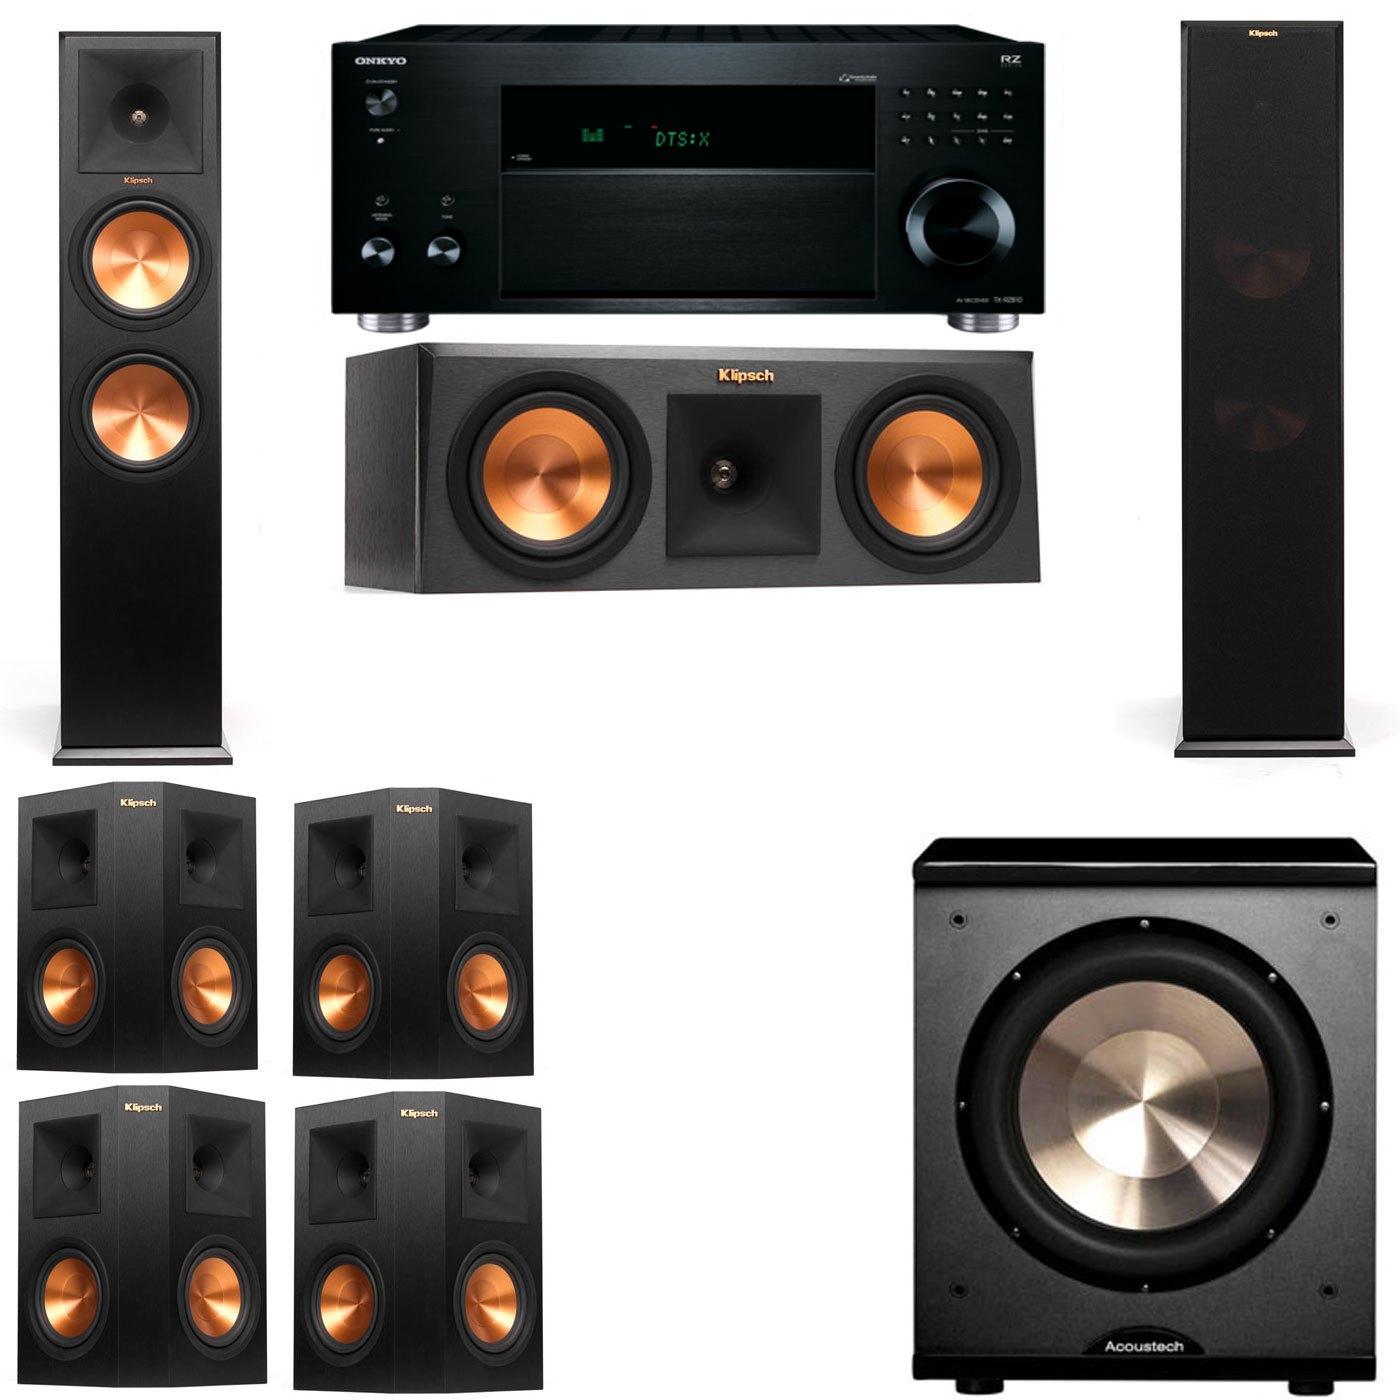 Klipsch RP-280F Tower Speakers-RP-250C-PL-200-7.1-Onkyo TX-RZ810